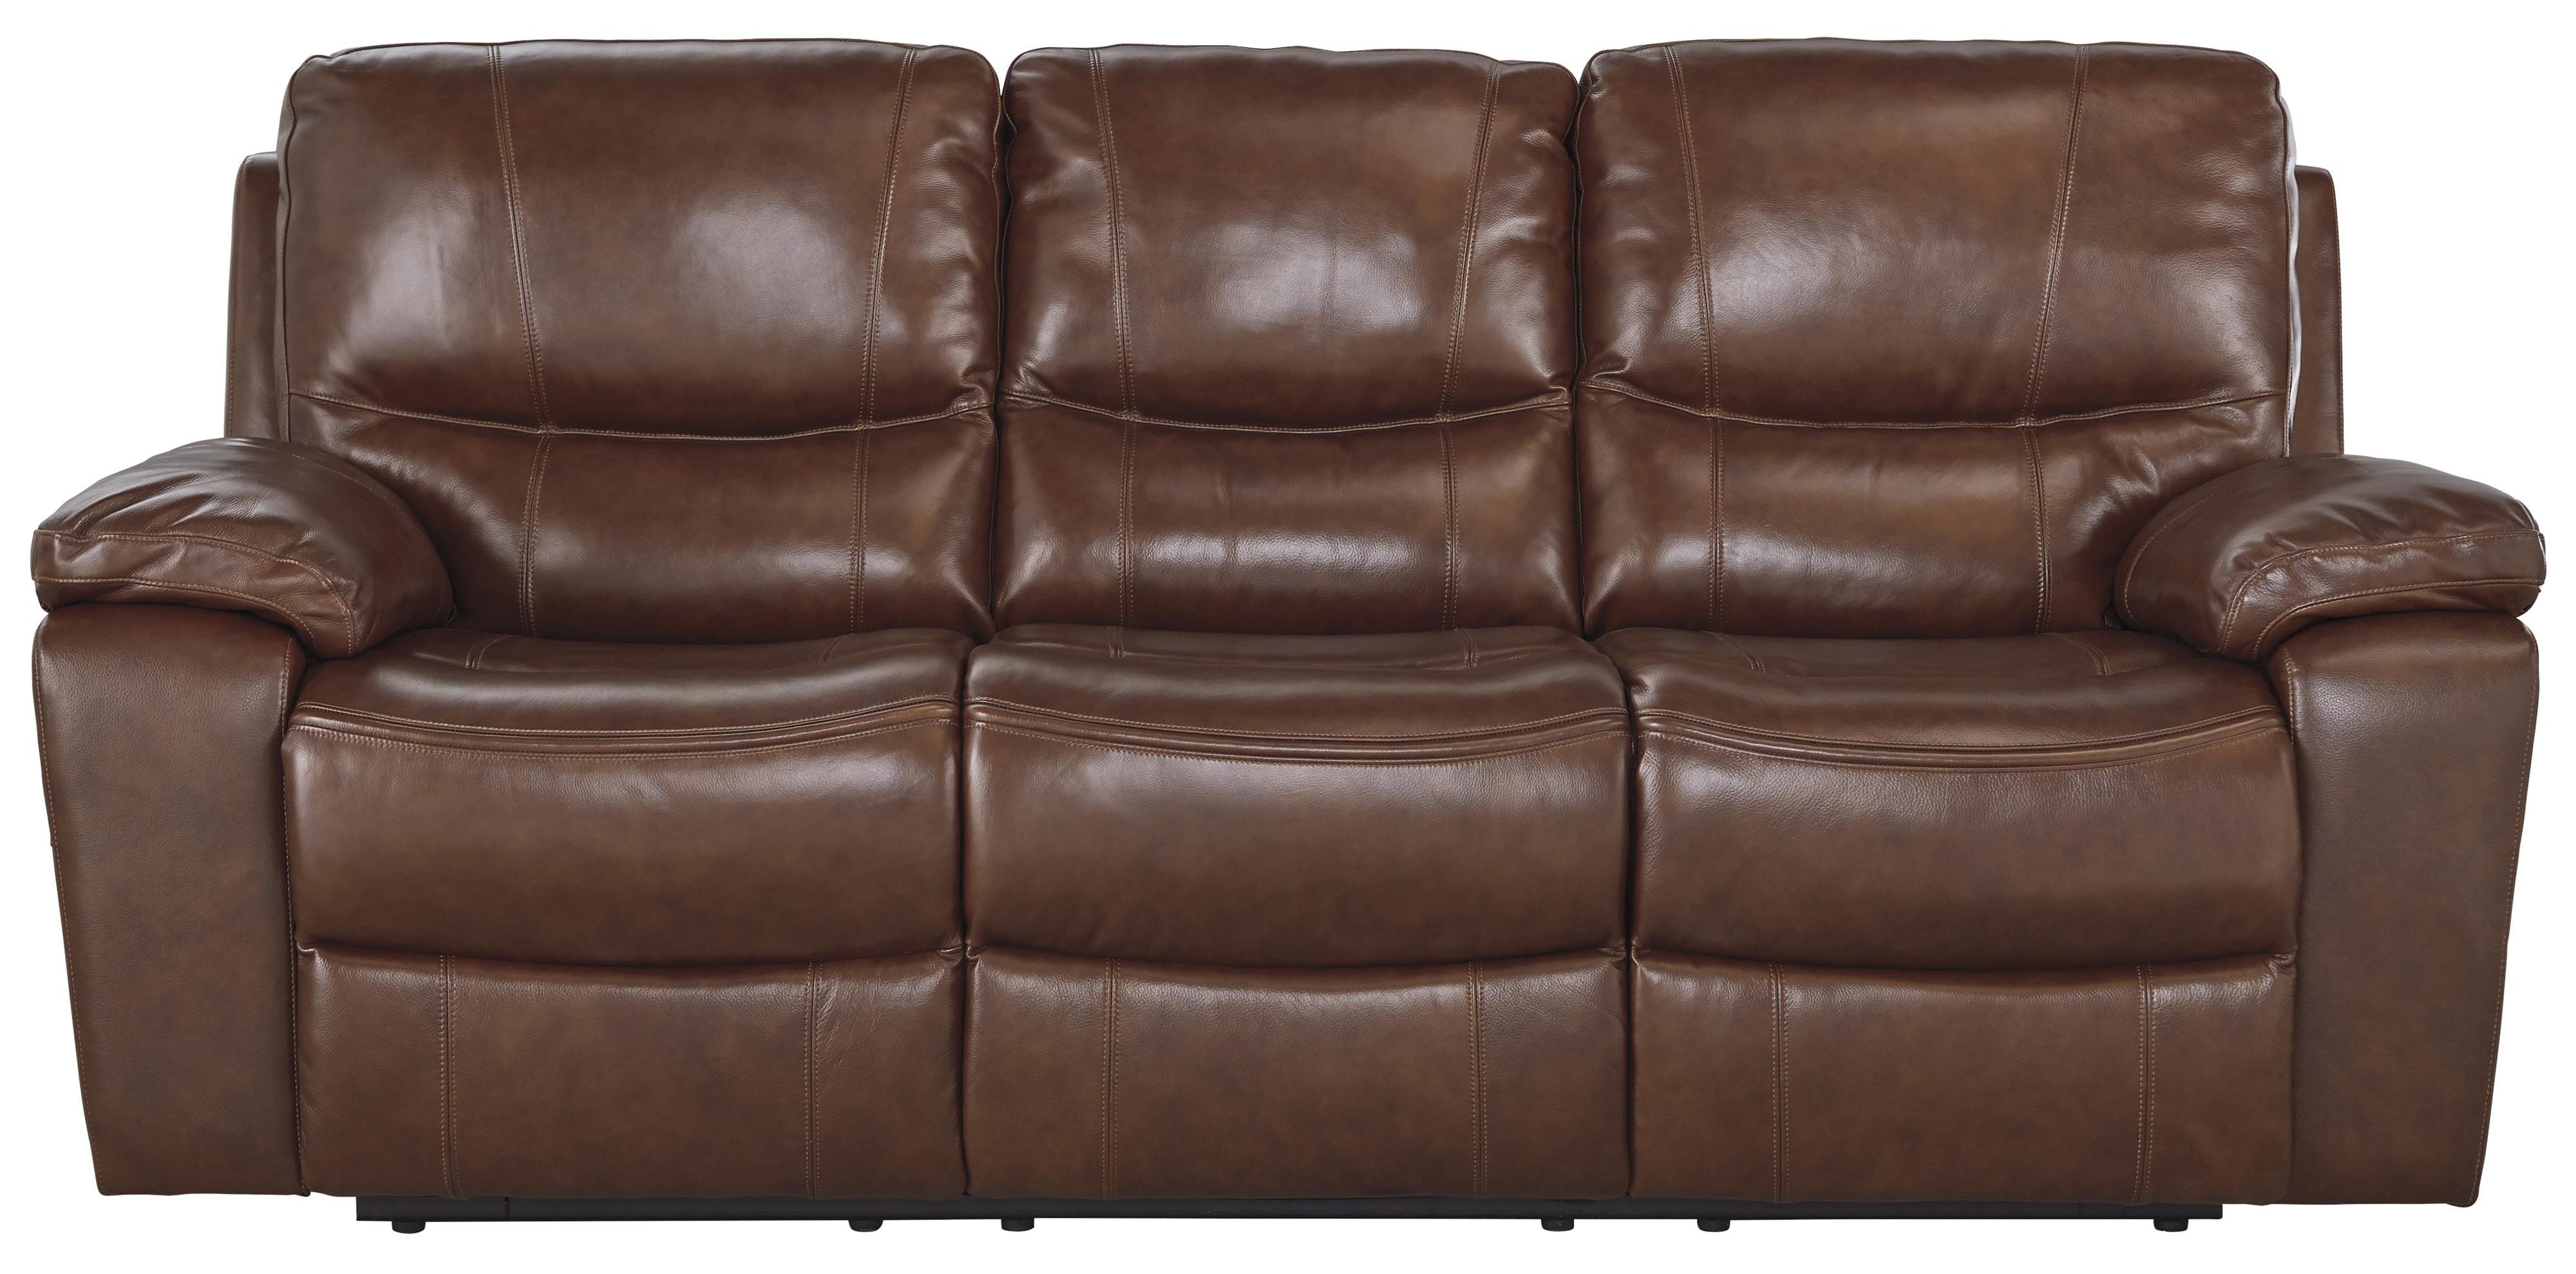 Signature Design by Ashley Panache Reclining Sofa - Item Number: U7290088